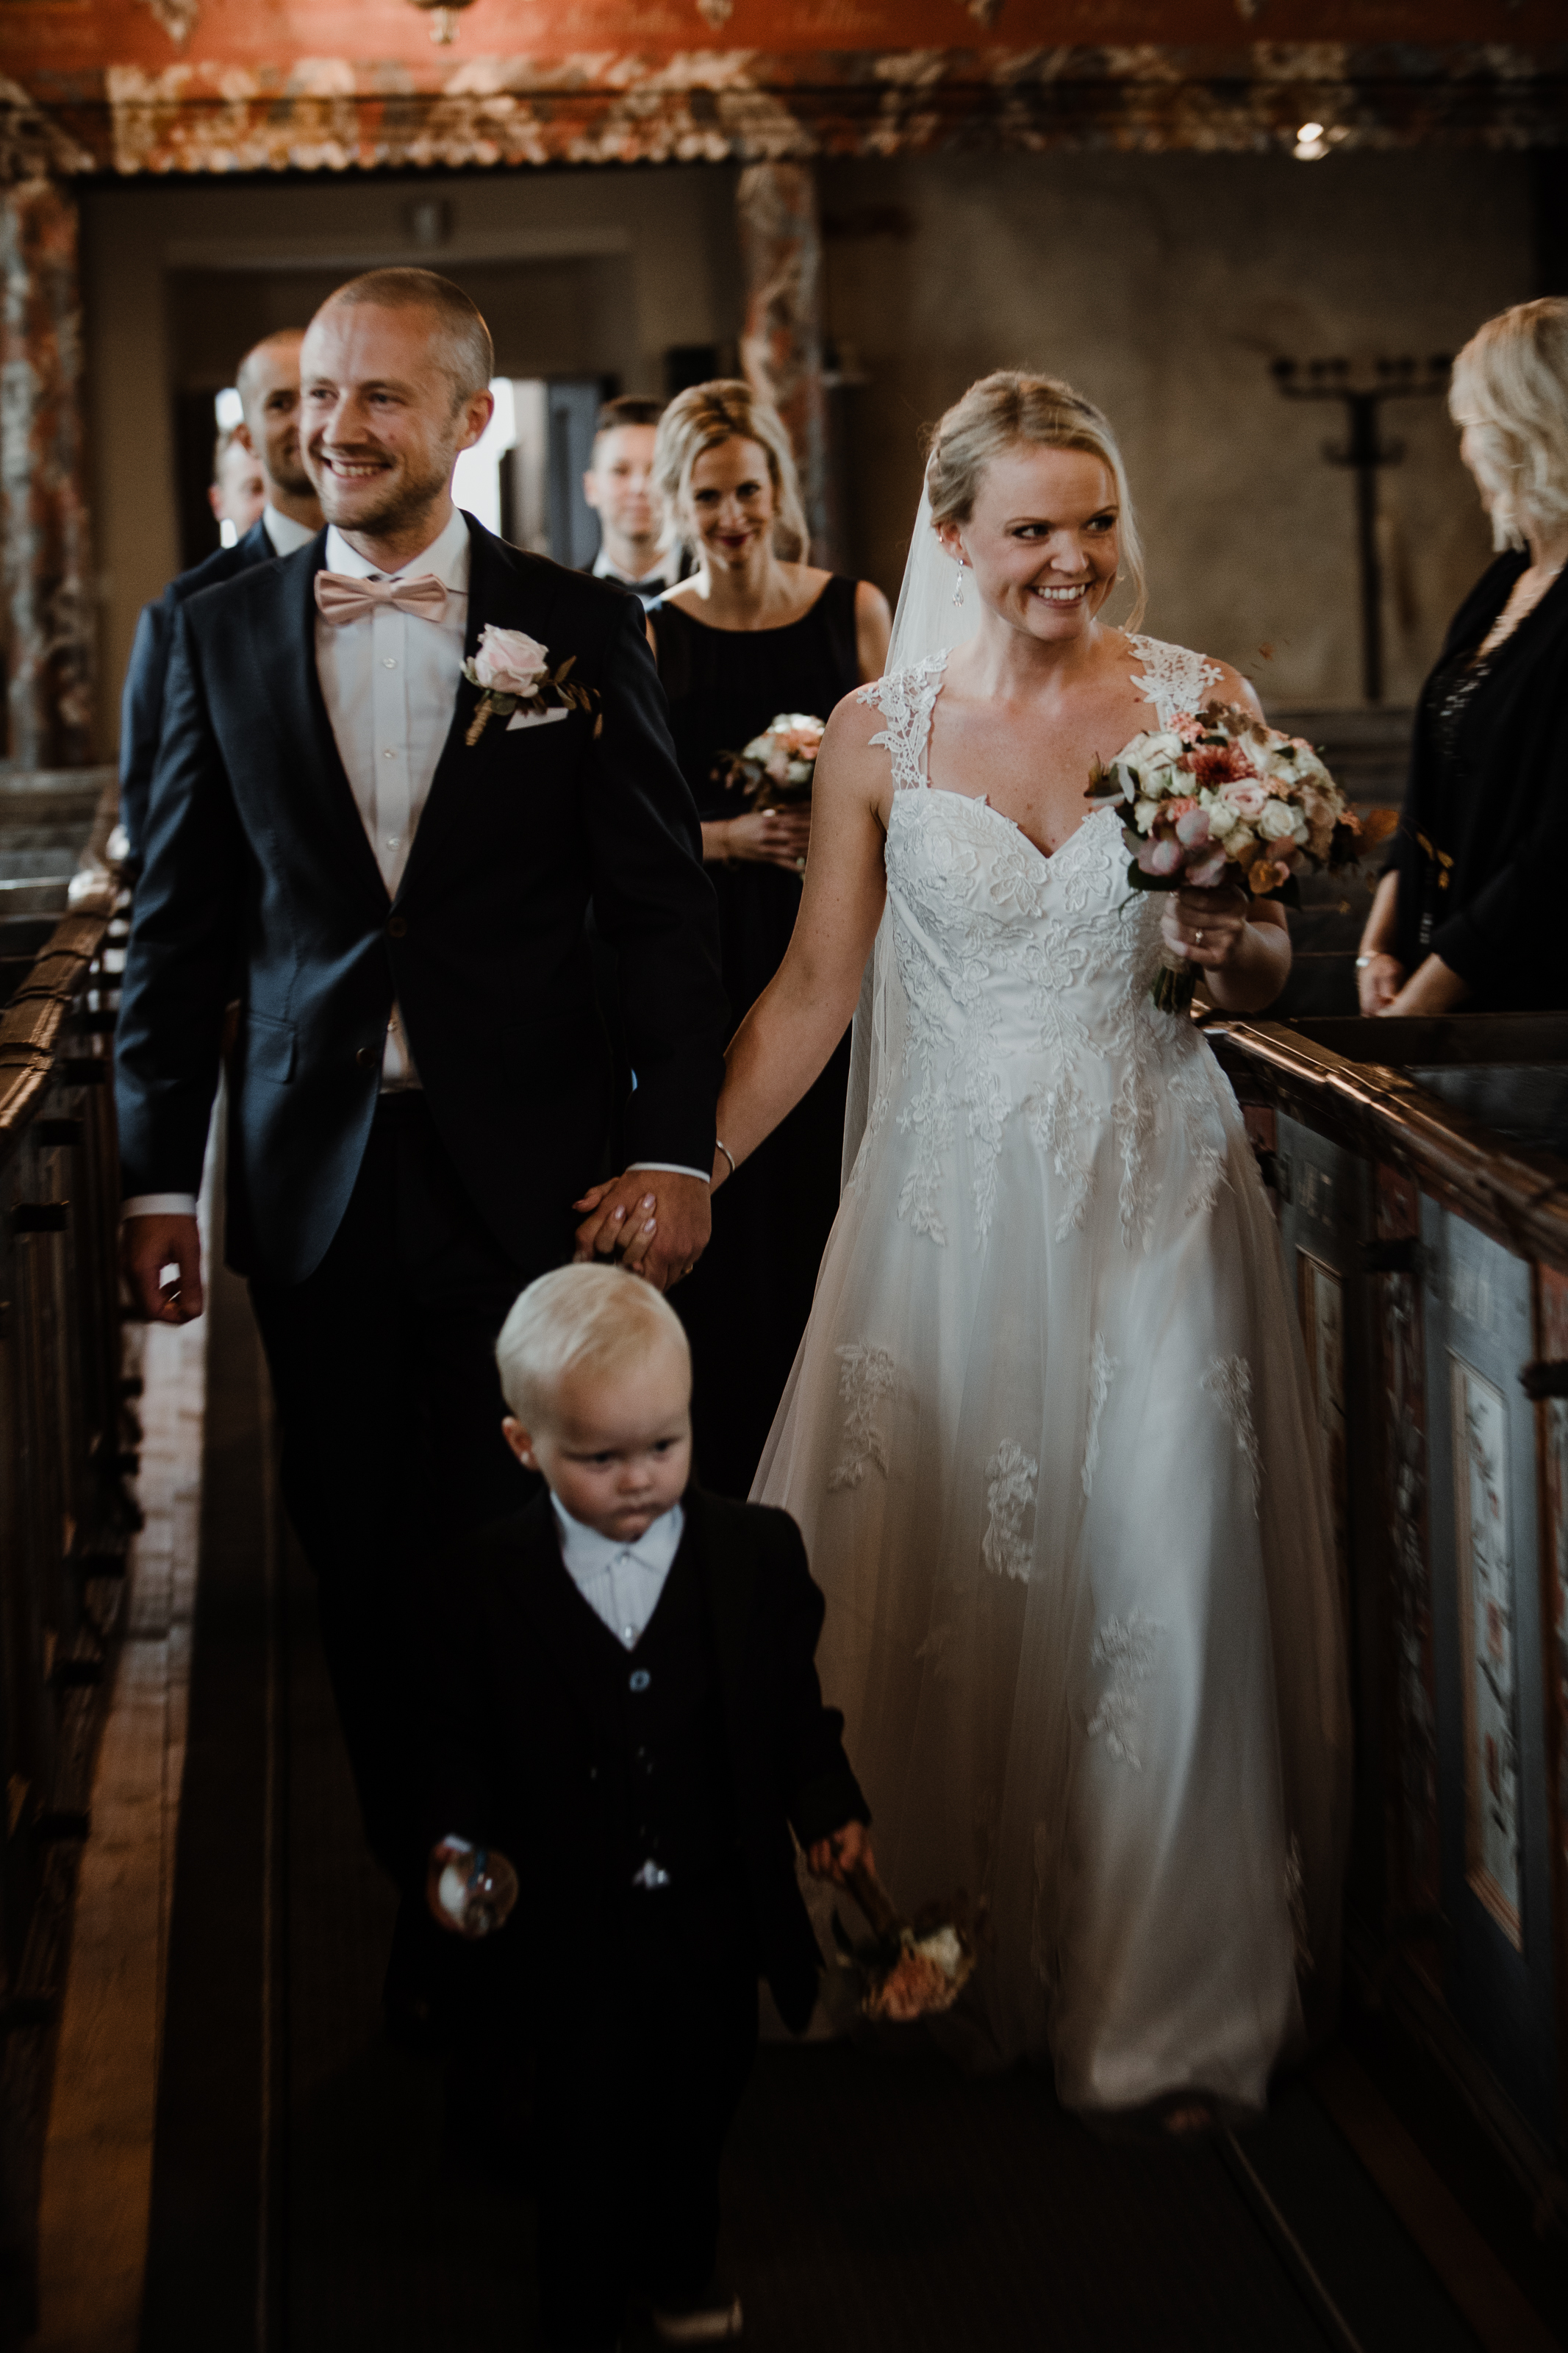 Bröllopsfotograf-Uddetorp Säteri-Höstbröllop-Fotograf Emilia- Bröllopsfotograf Borås-36.jpg